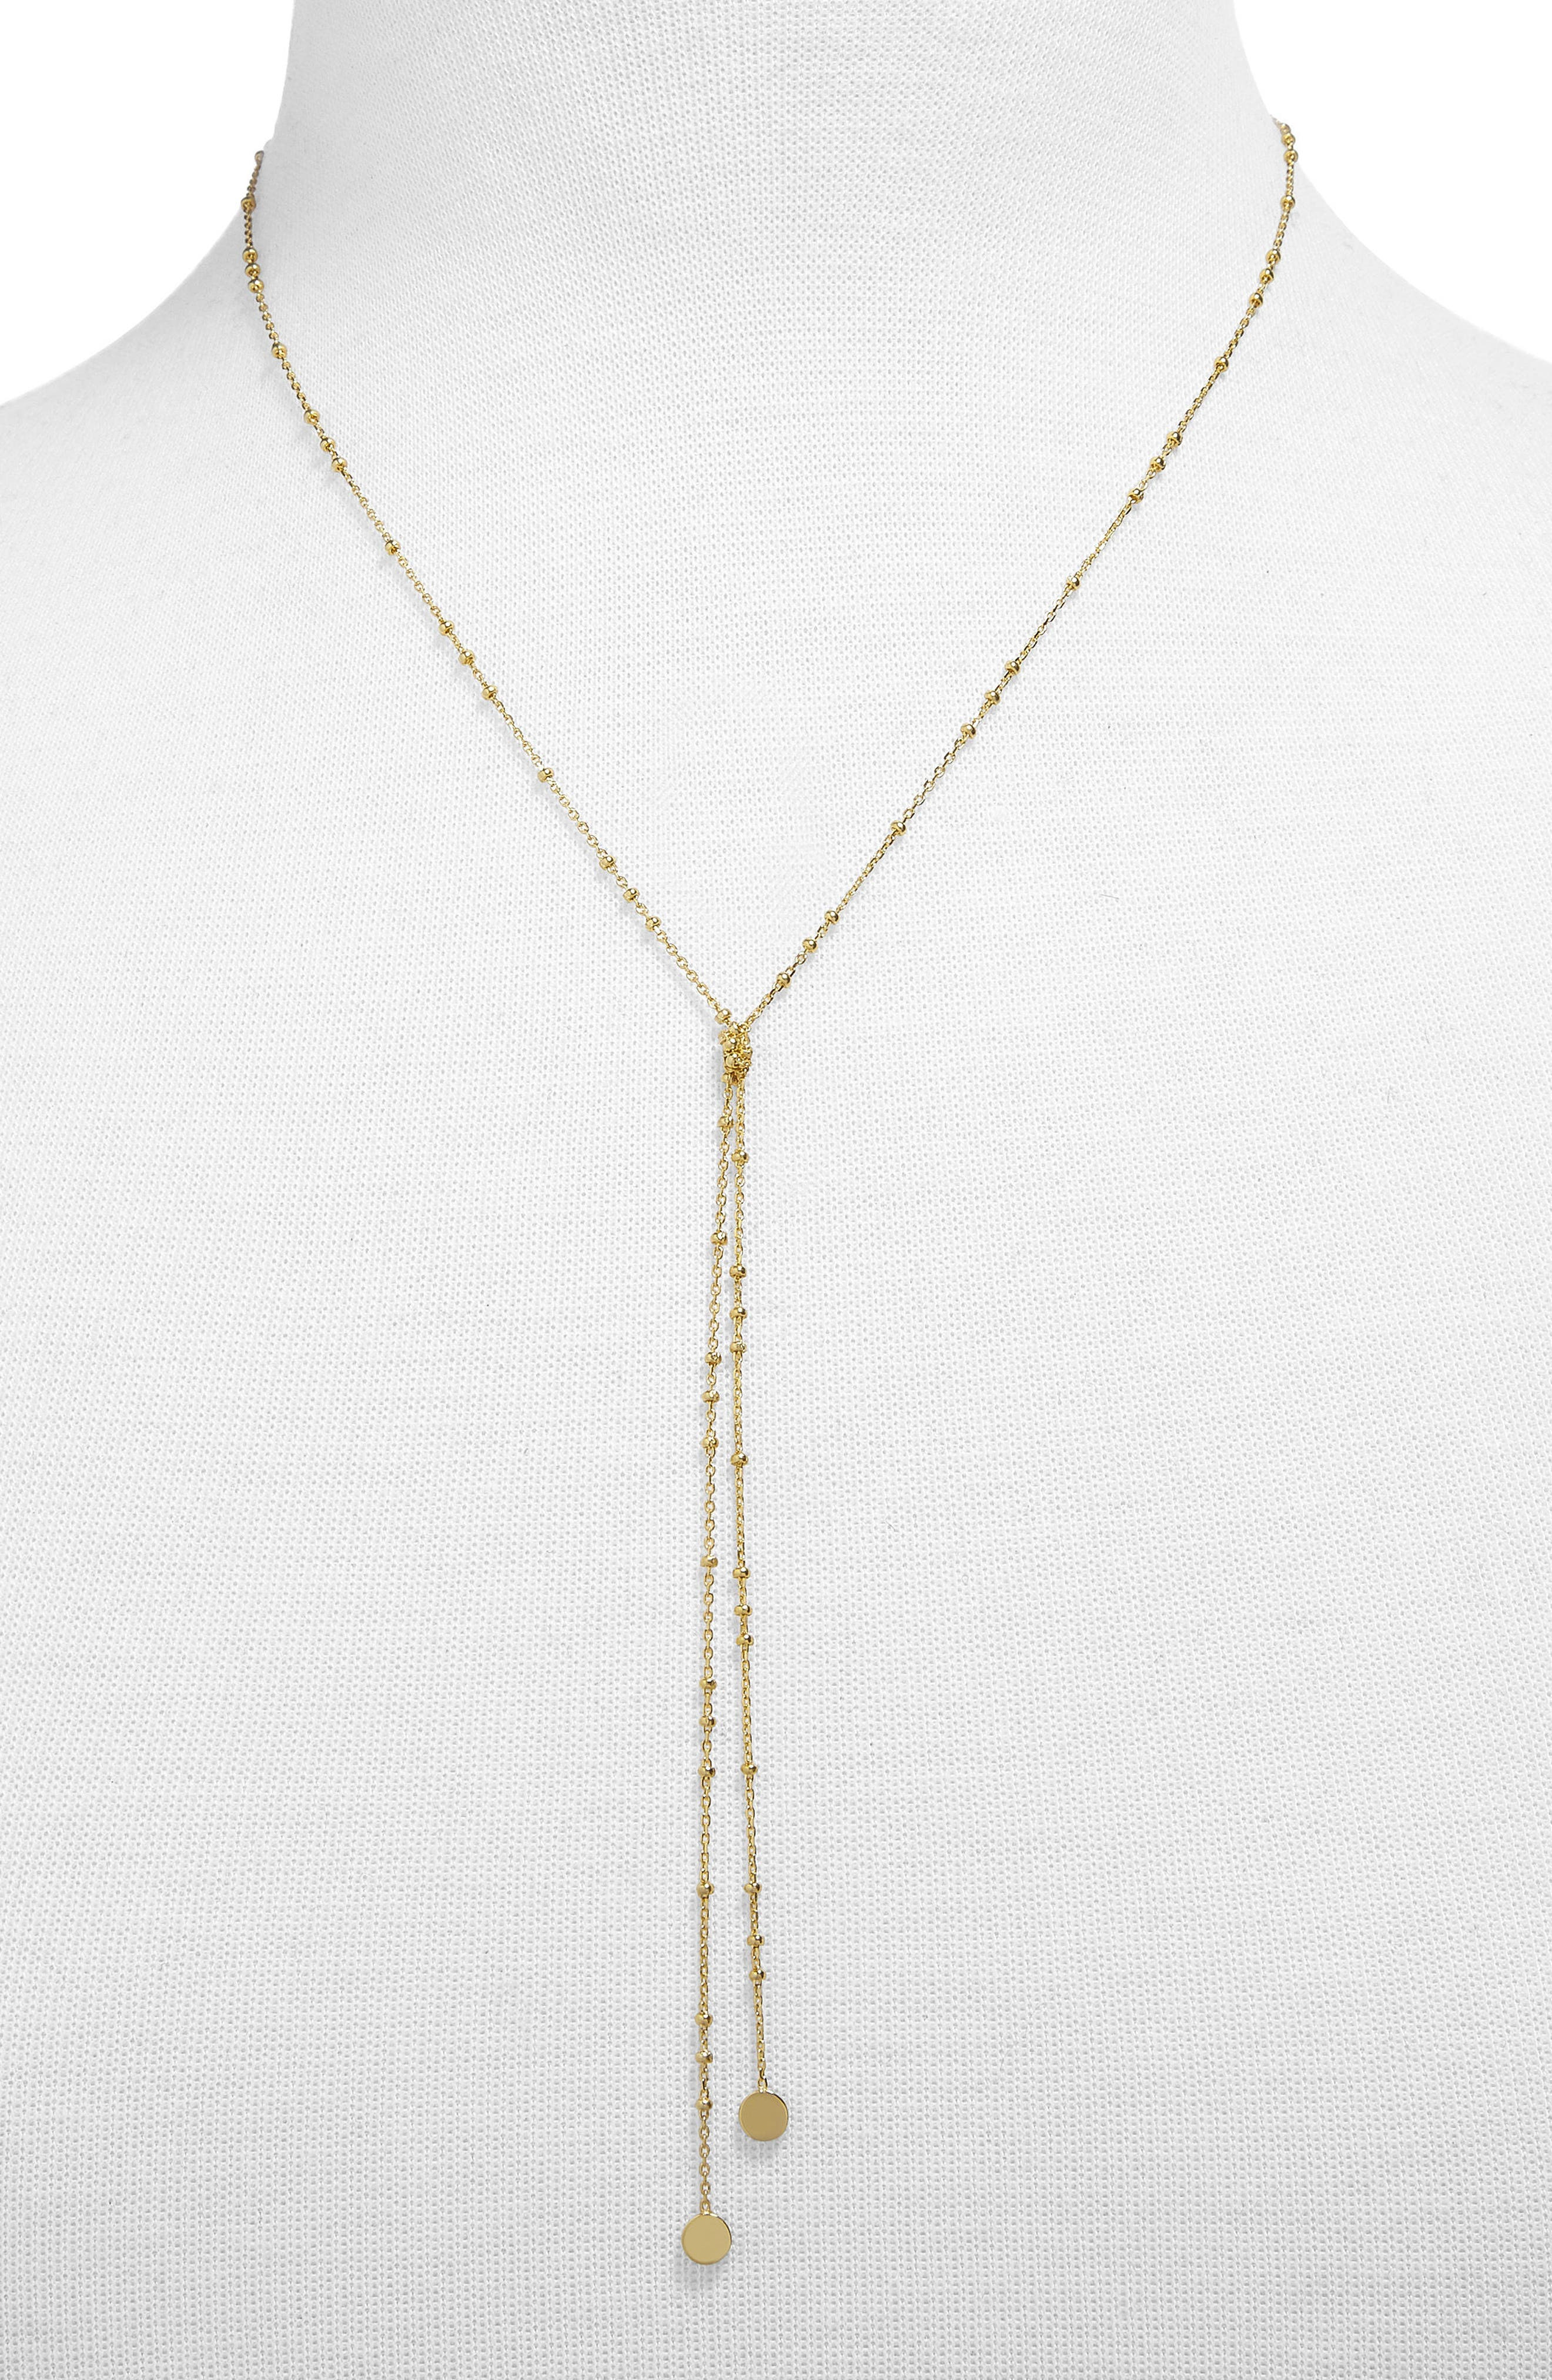 Palla Lariat Necklace,                         Main,                         color, Gold